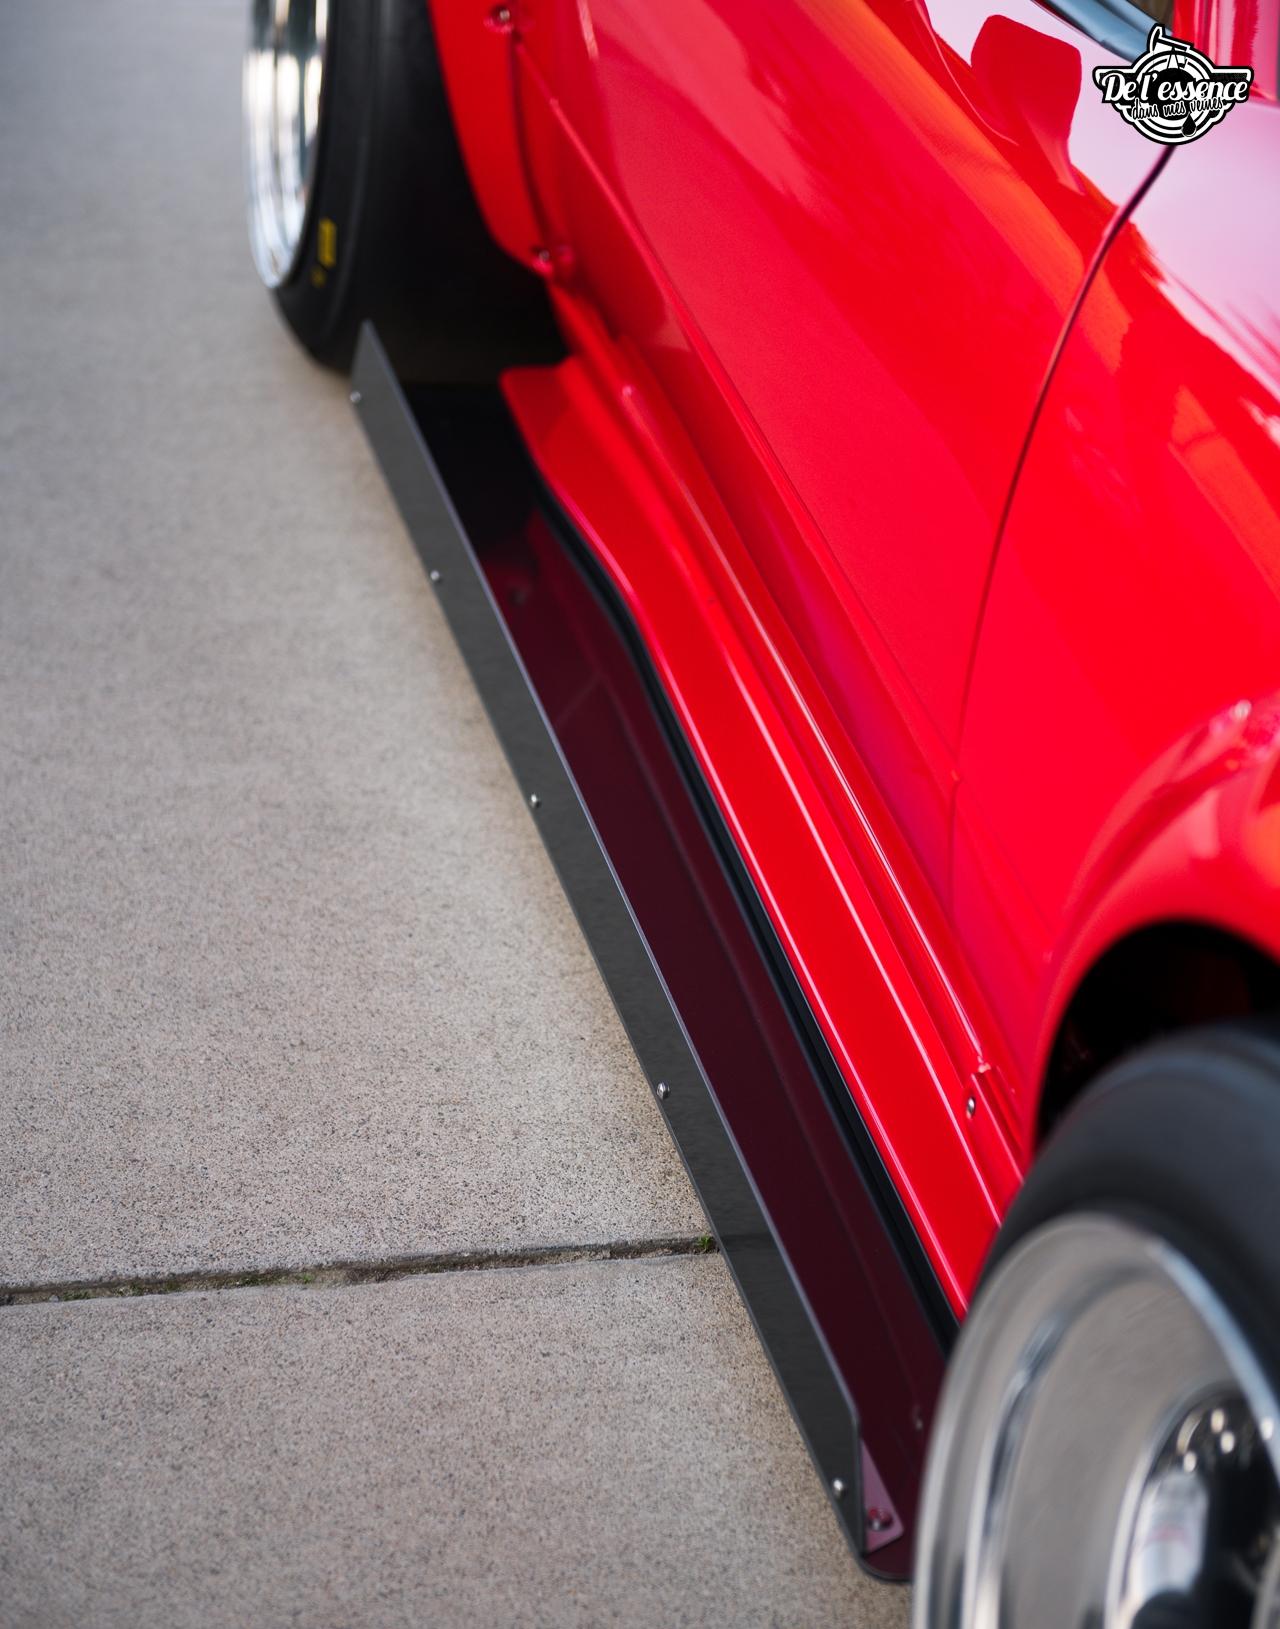 '94 Mazda Miata - Oh My God ! 5